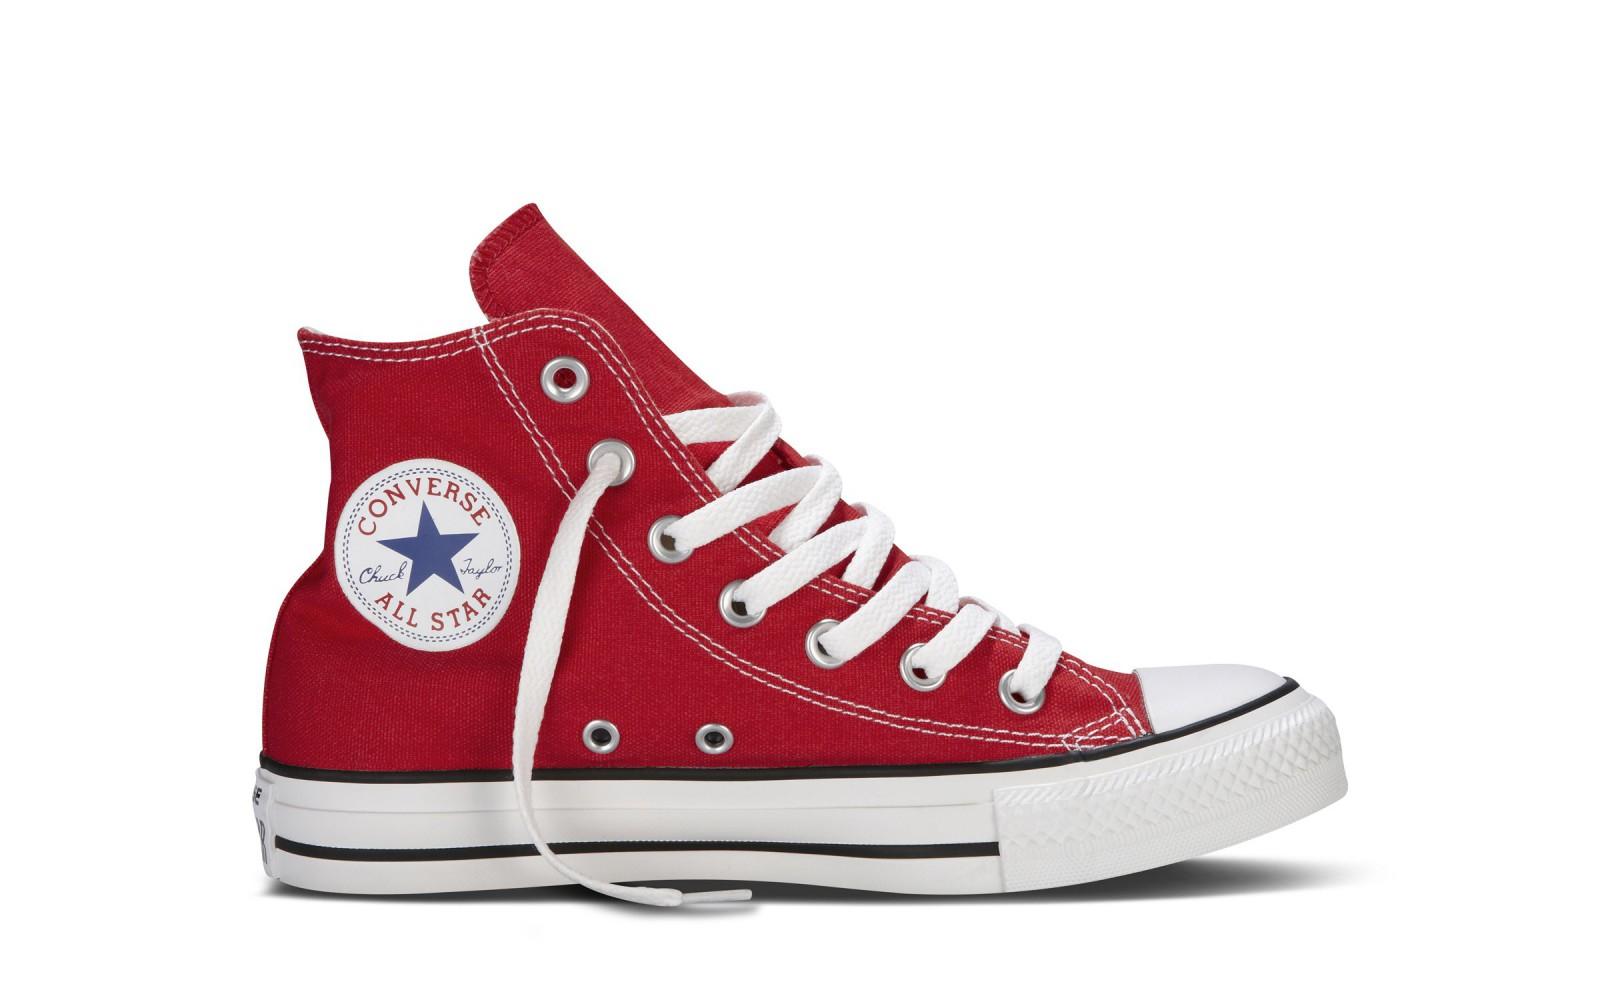 Pánské boty Converse Chuck Taylor All Star červené  ca30ee2ce8